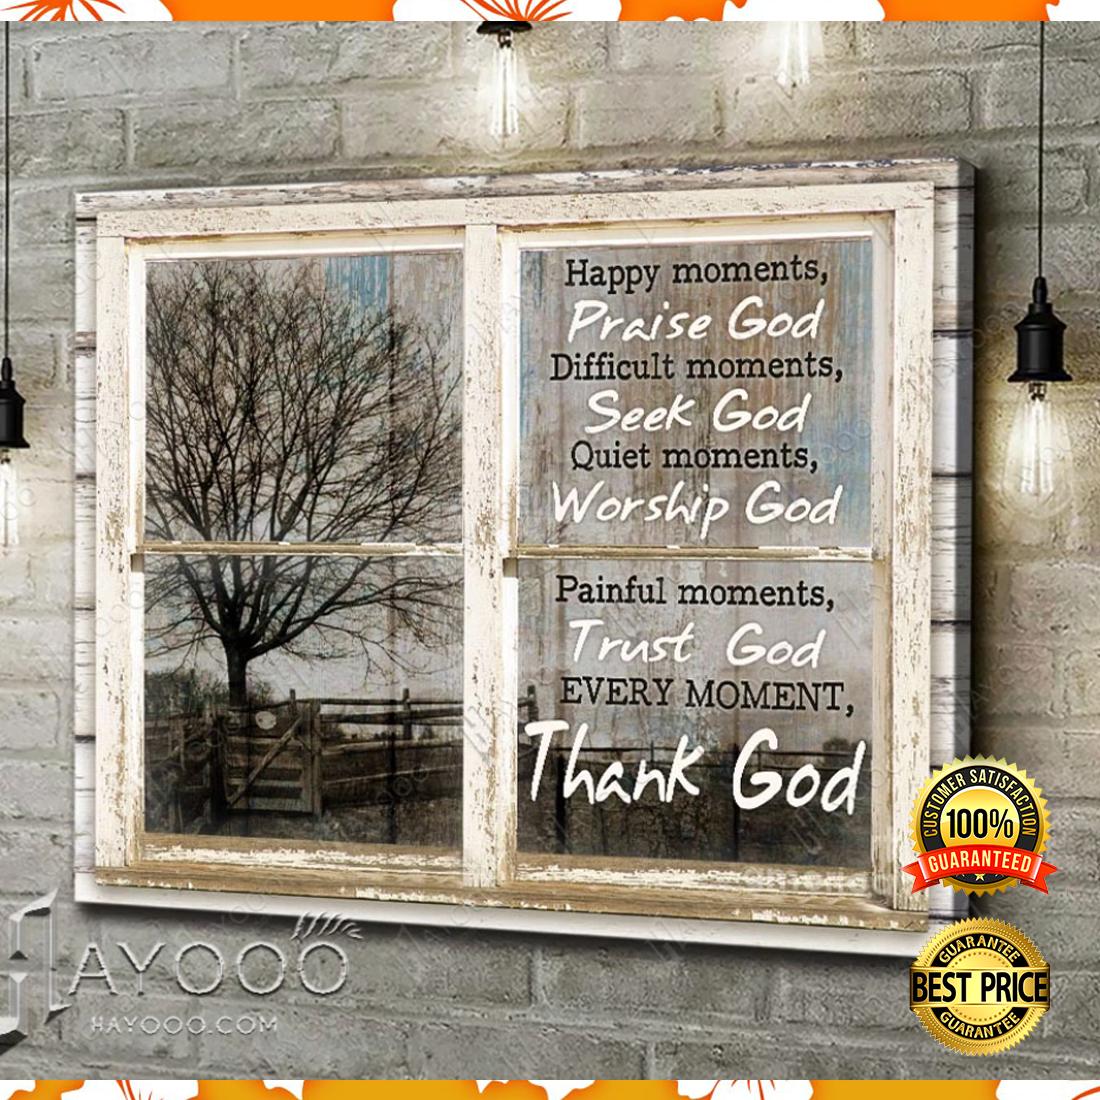 Happy moments praise god difficult moments seek god canvas 5